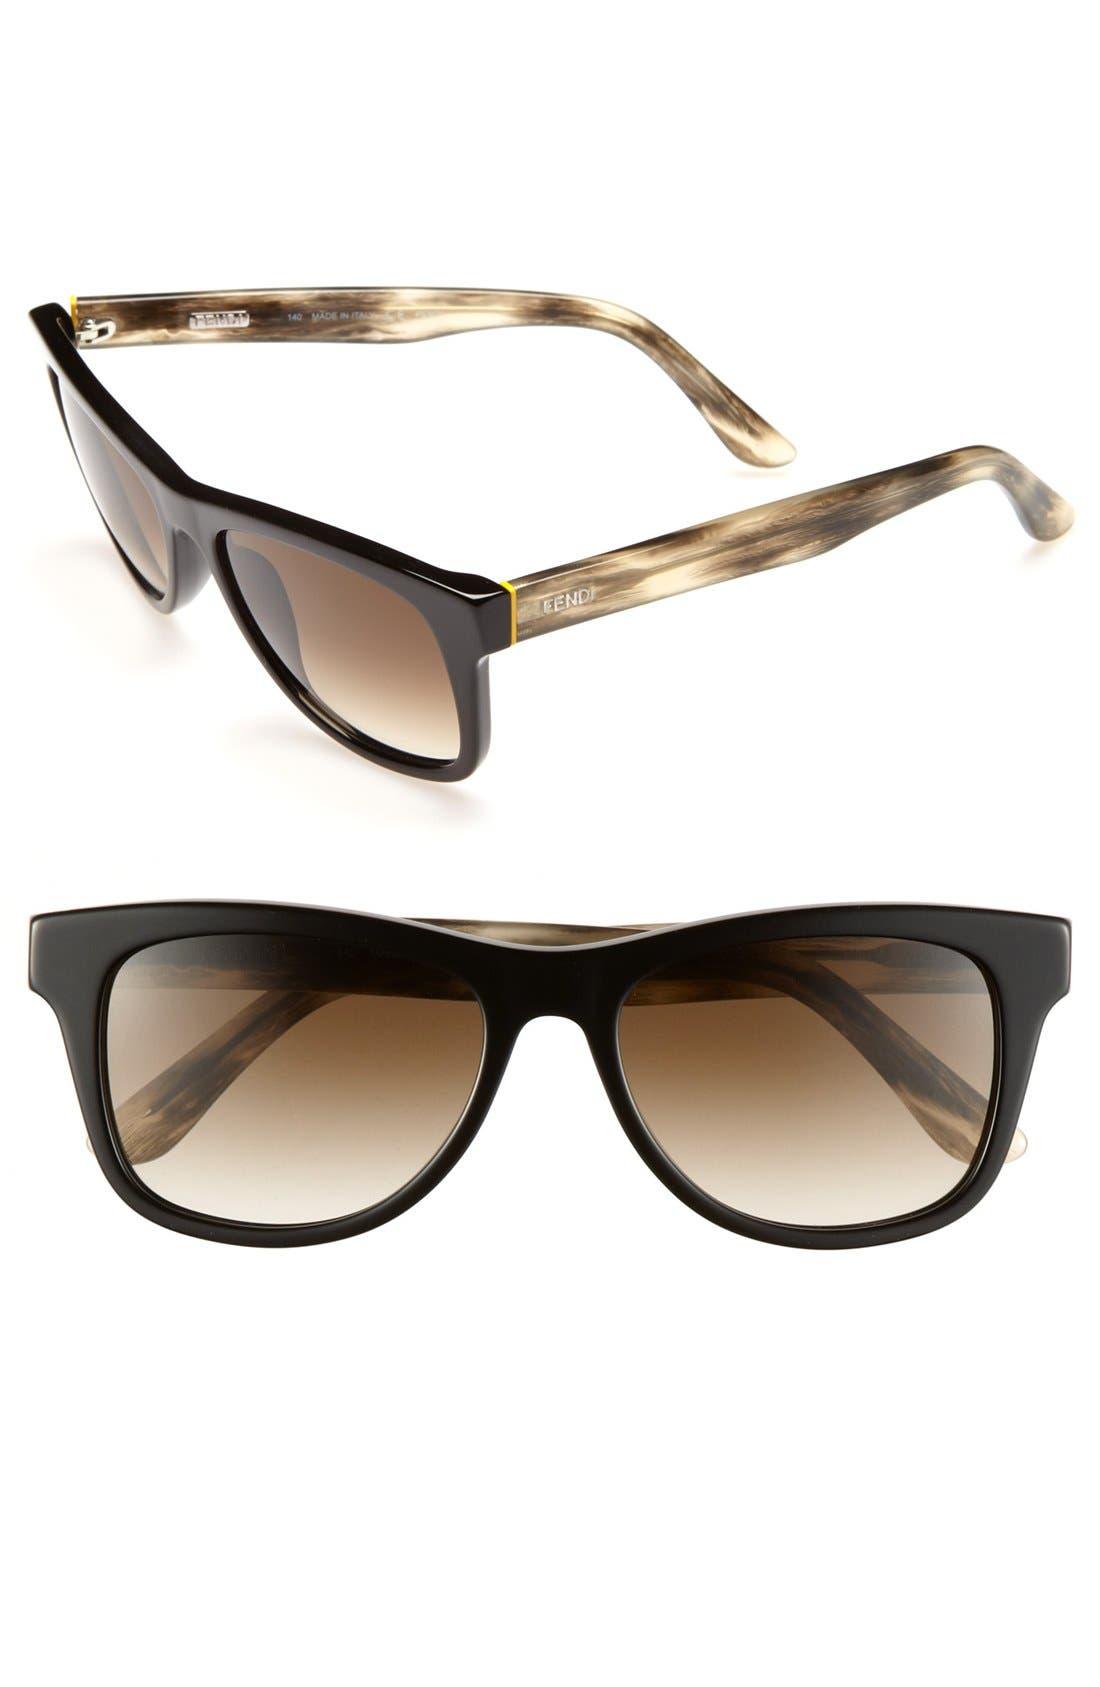 Main Image - Fendi 53mm Retro Sunglasses